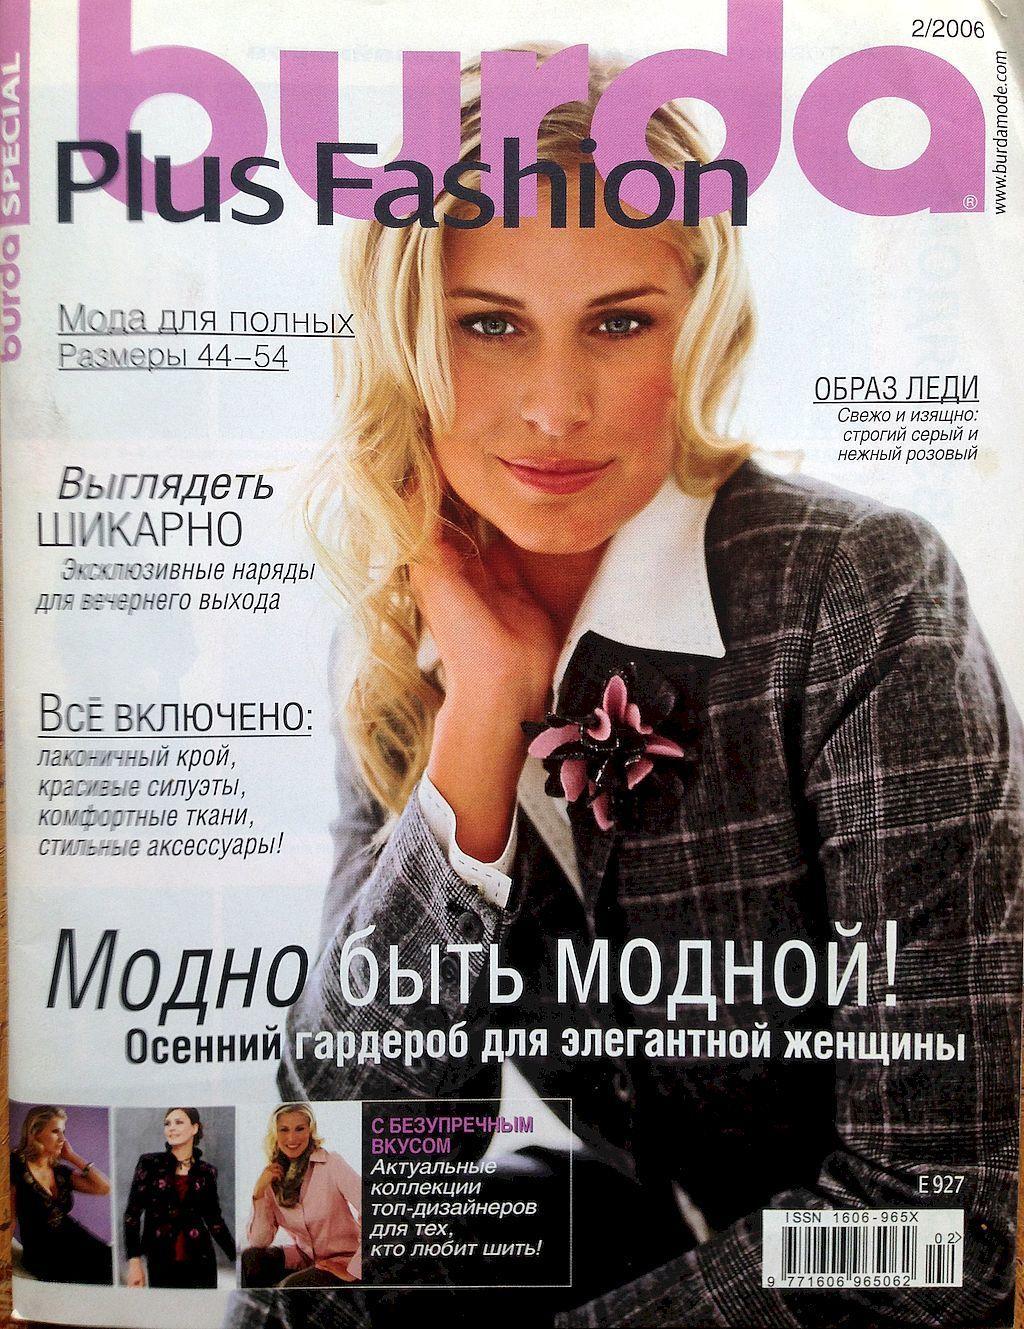 "Burda SPECIAL "" Мода для полных"", № 2/2006, Выкройки для шитья, Москва,  Фото №1"